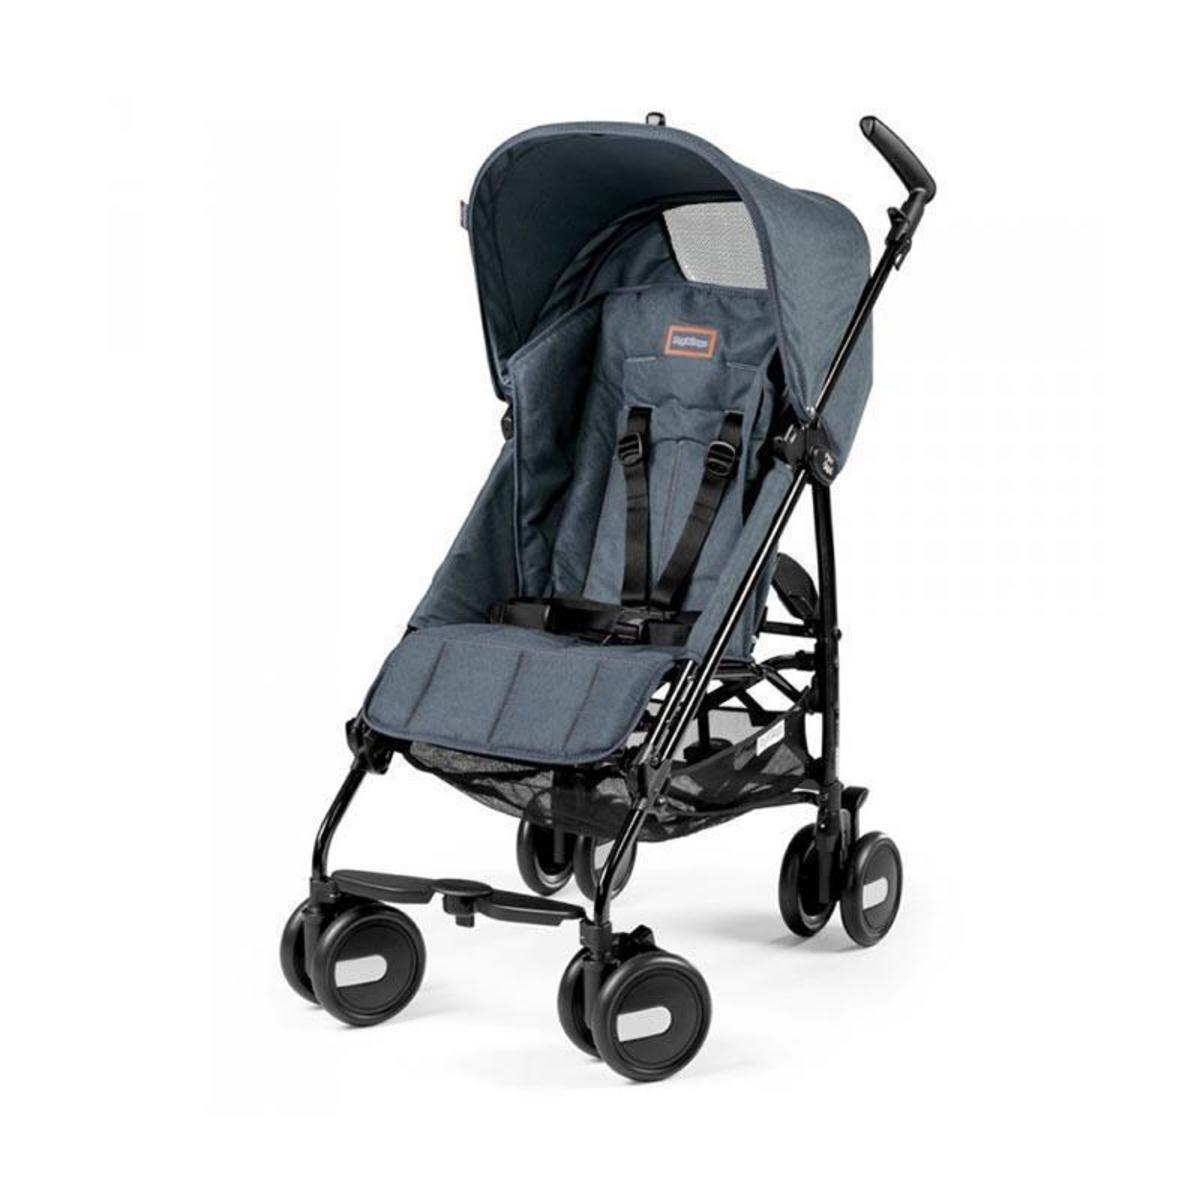 Pliko Mini 嬰幼兒手推車(0-4歲) 香港行貨 (多款) - 深色牛仔